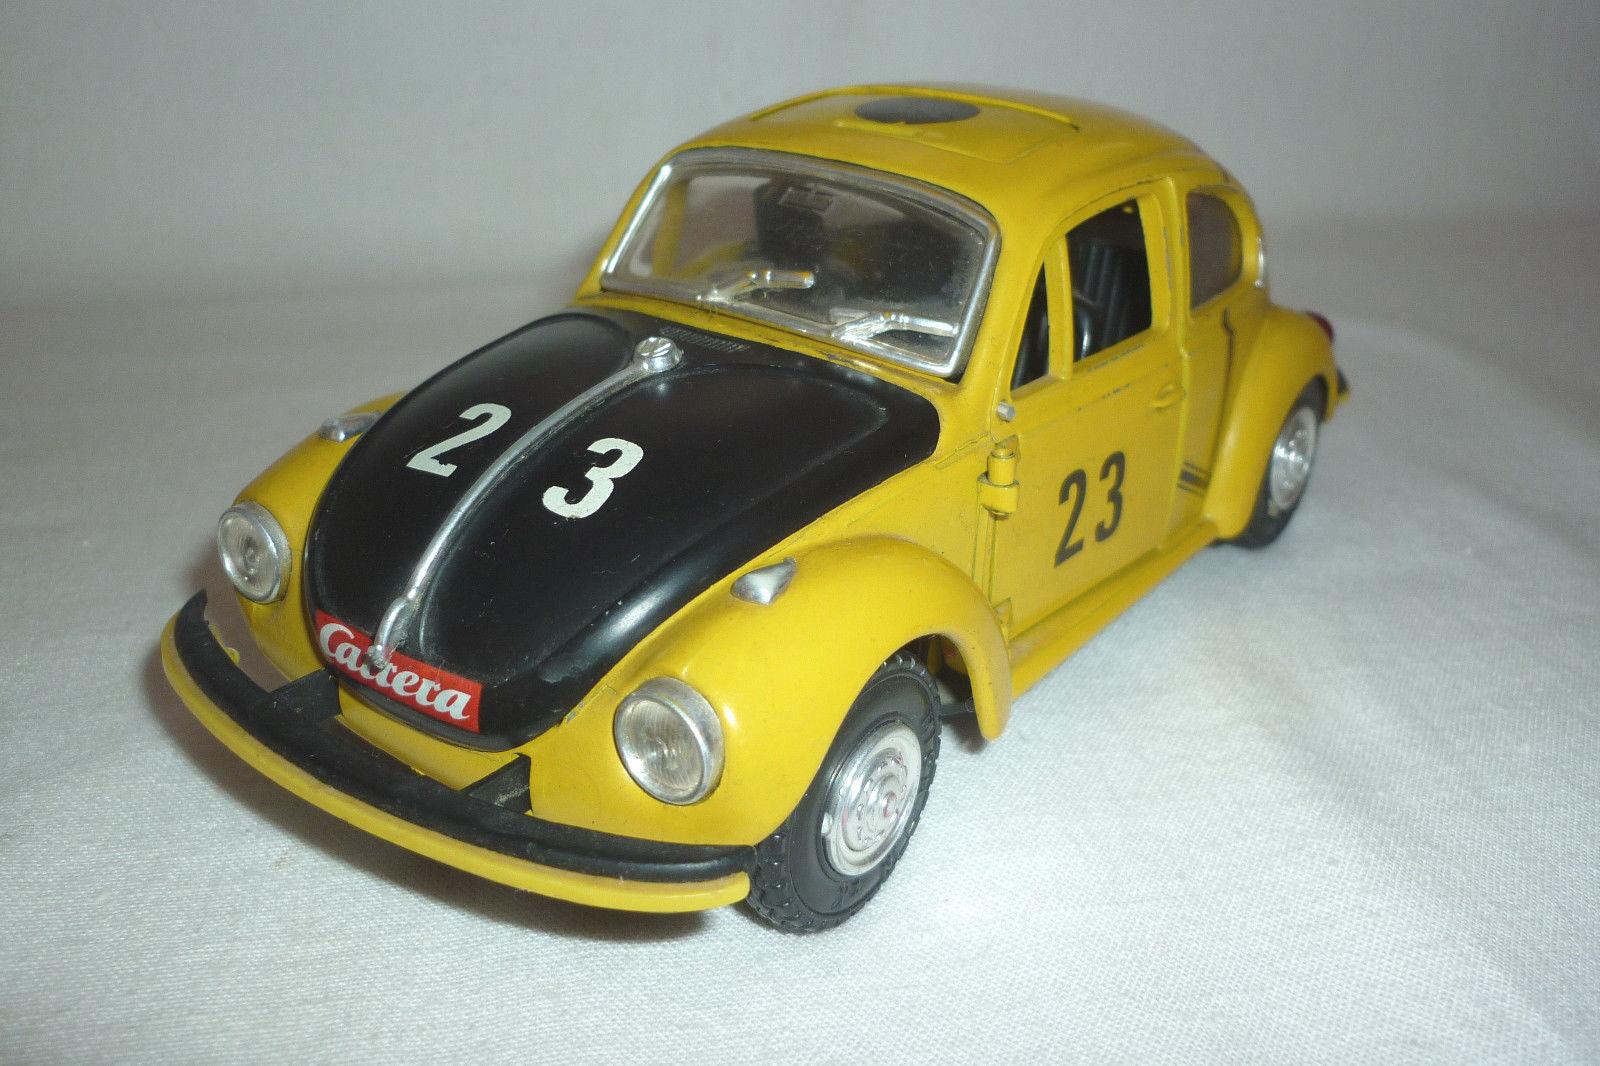 Gama super-modelo-VW 1302 escarabajo - 1 24 - (5.div-39)